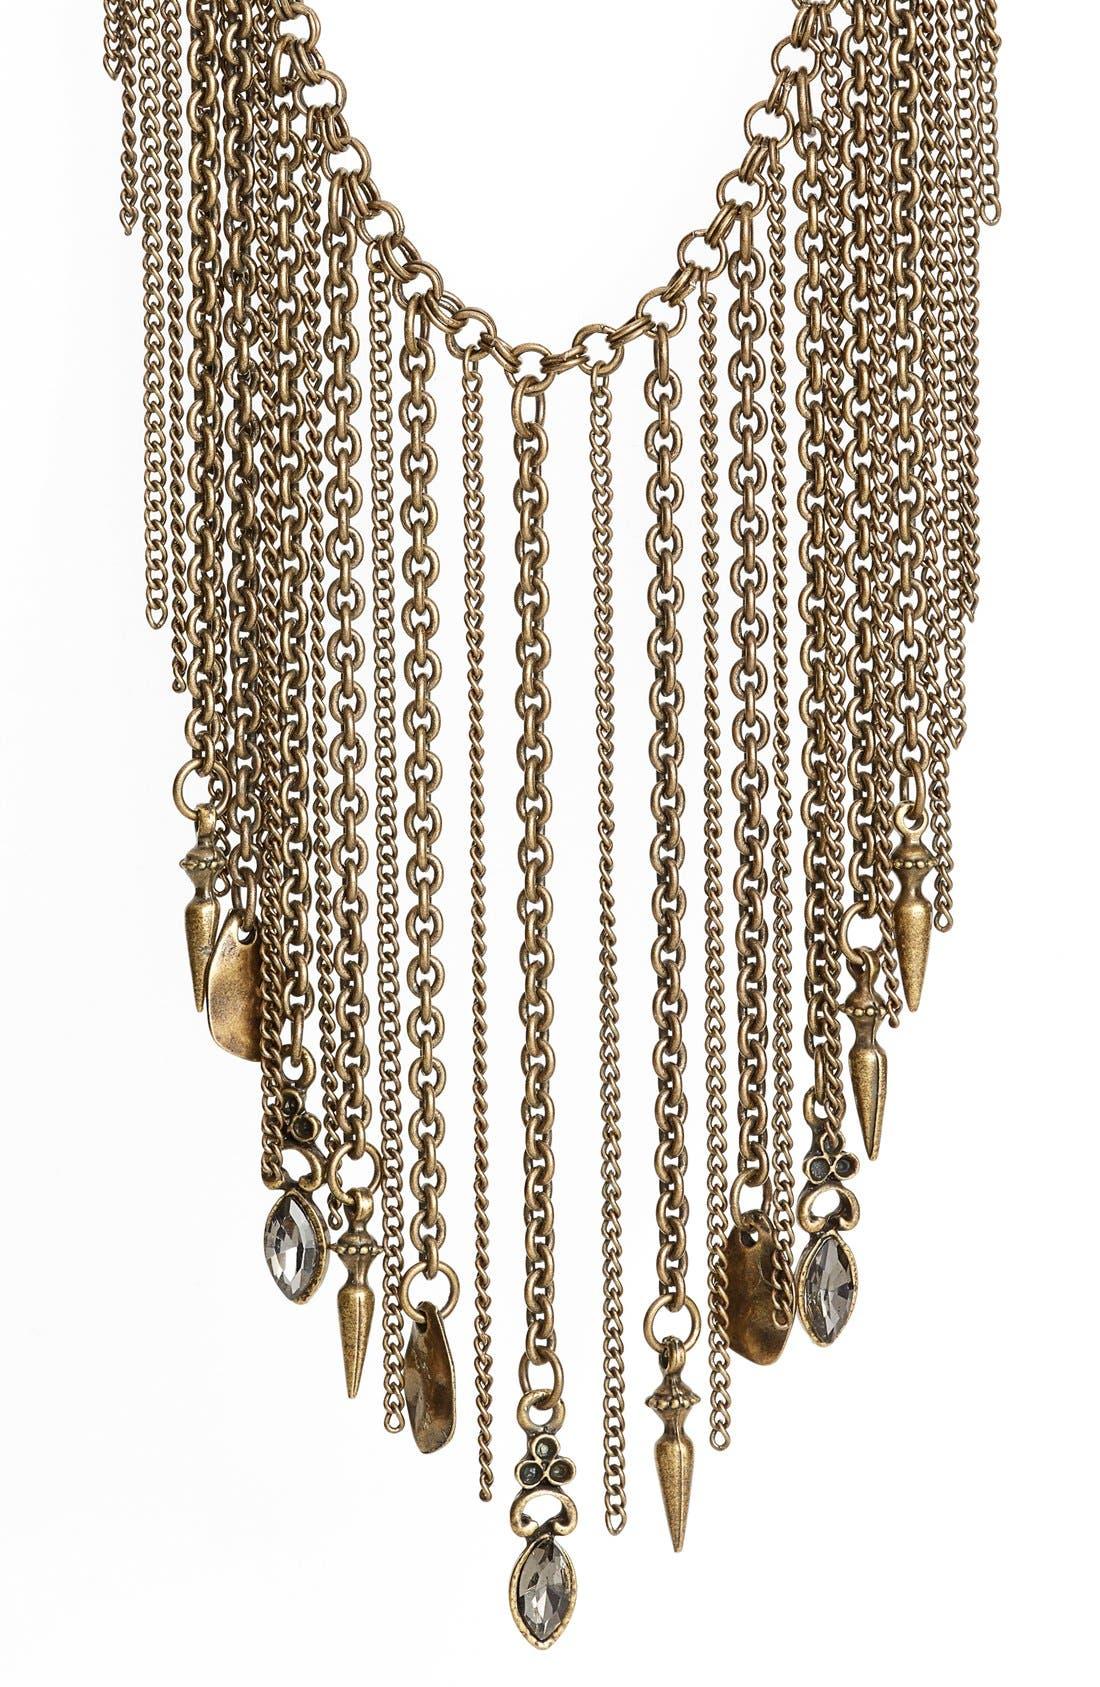 Fringe Tassel Statement Necklace,                             Alternate thumbnail 2, color,                             Antique Brass/ Gold